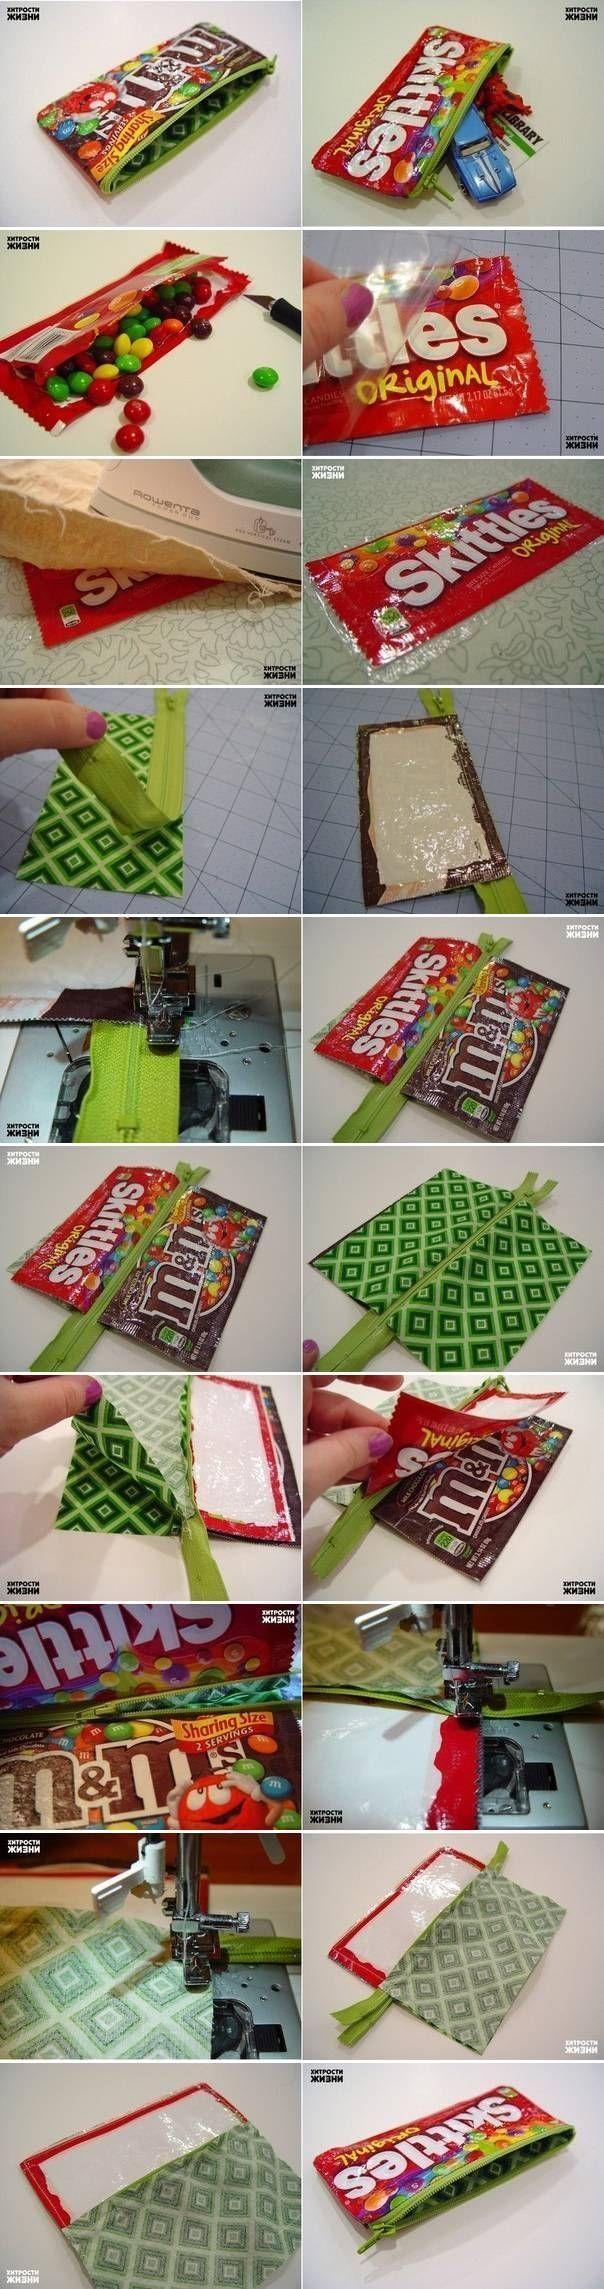 DIY Skittles/Schokoladen Täschchen